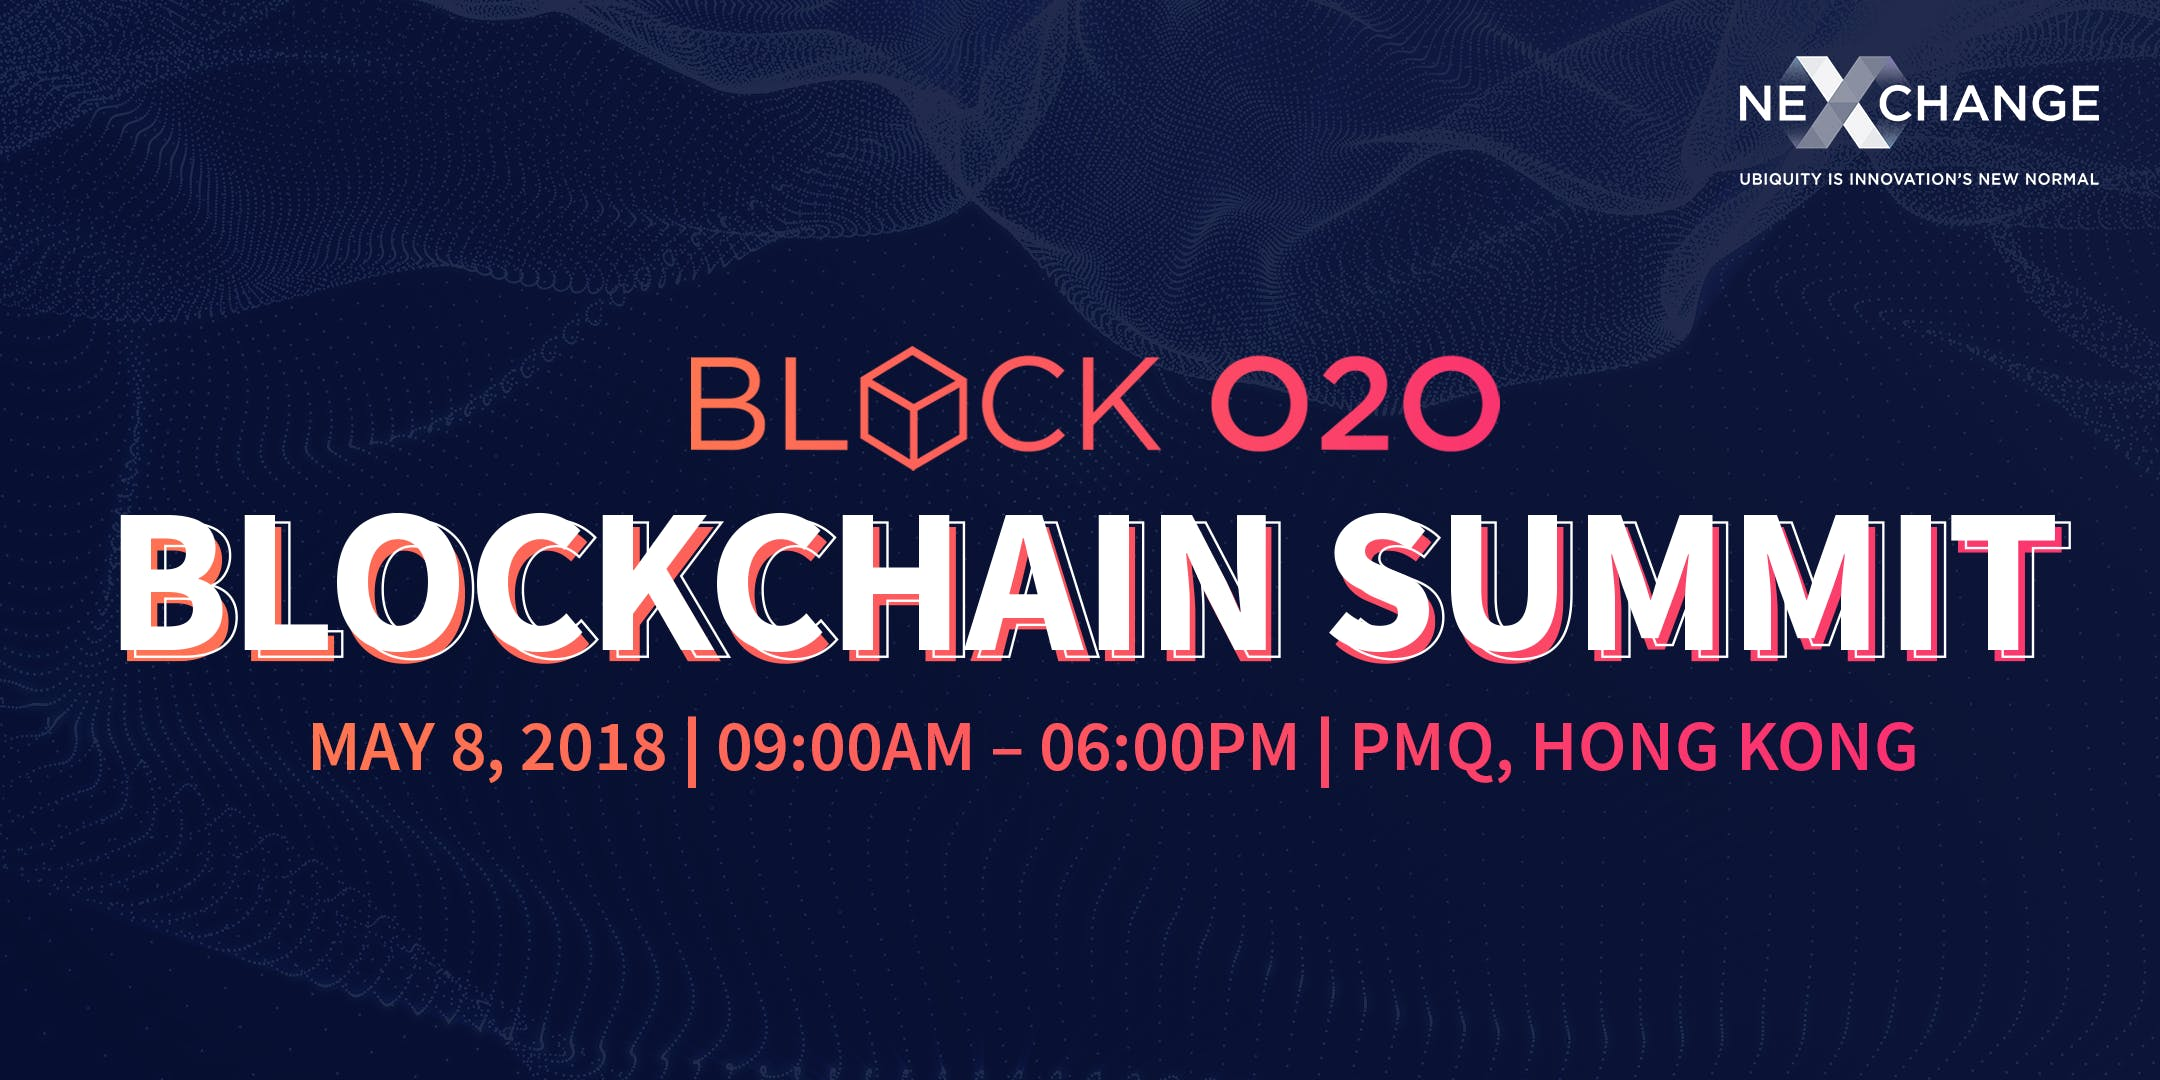 Block O2O Blockchain Summit 2018 (CPT Conside